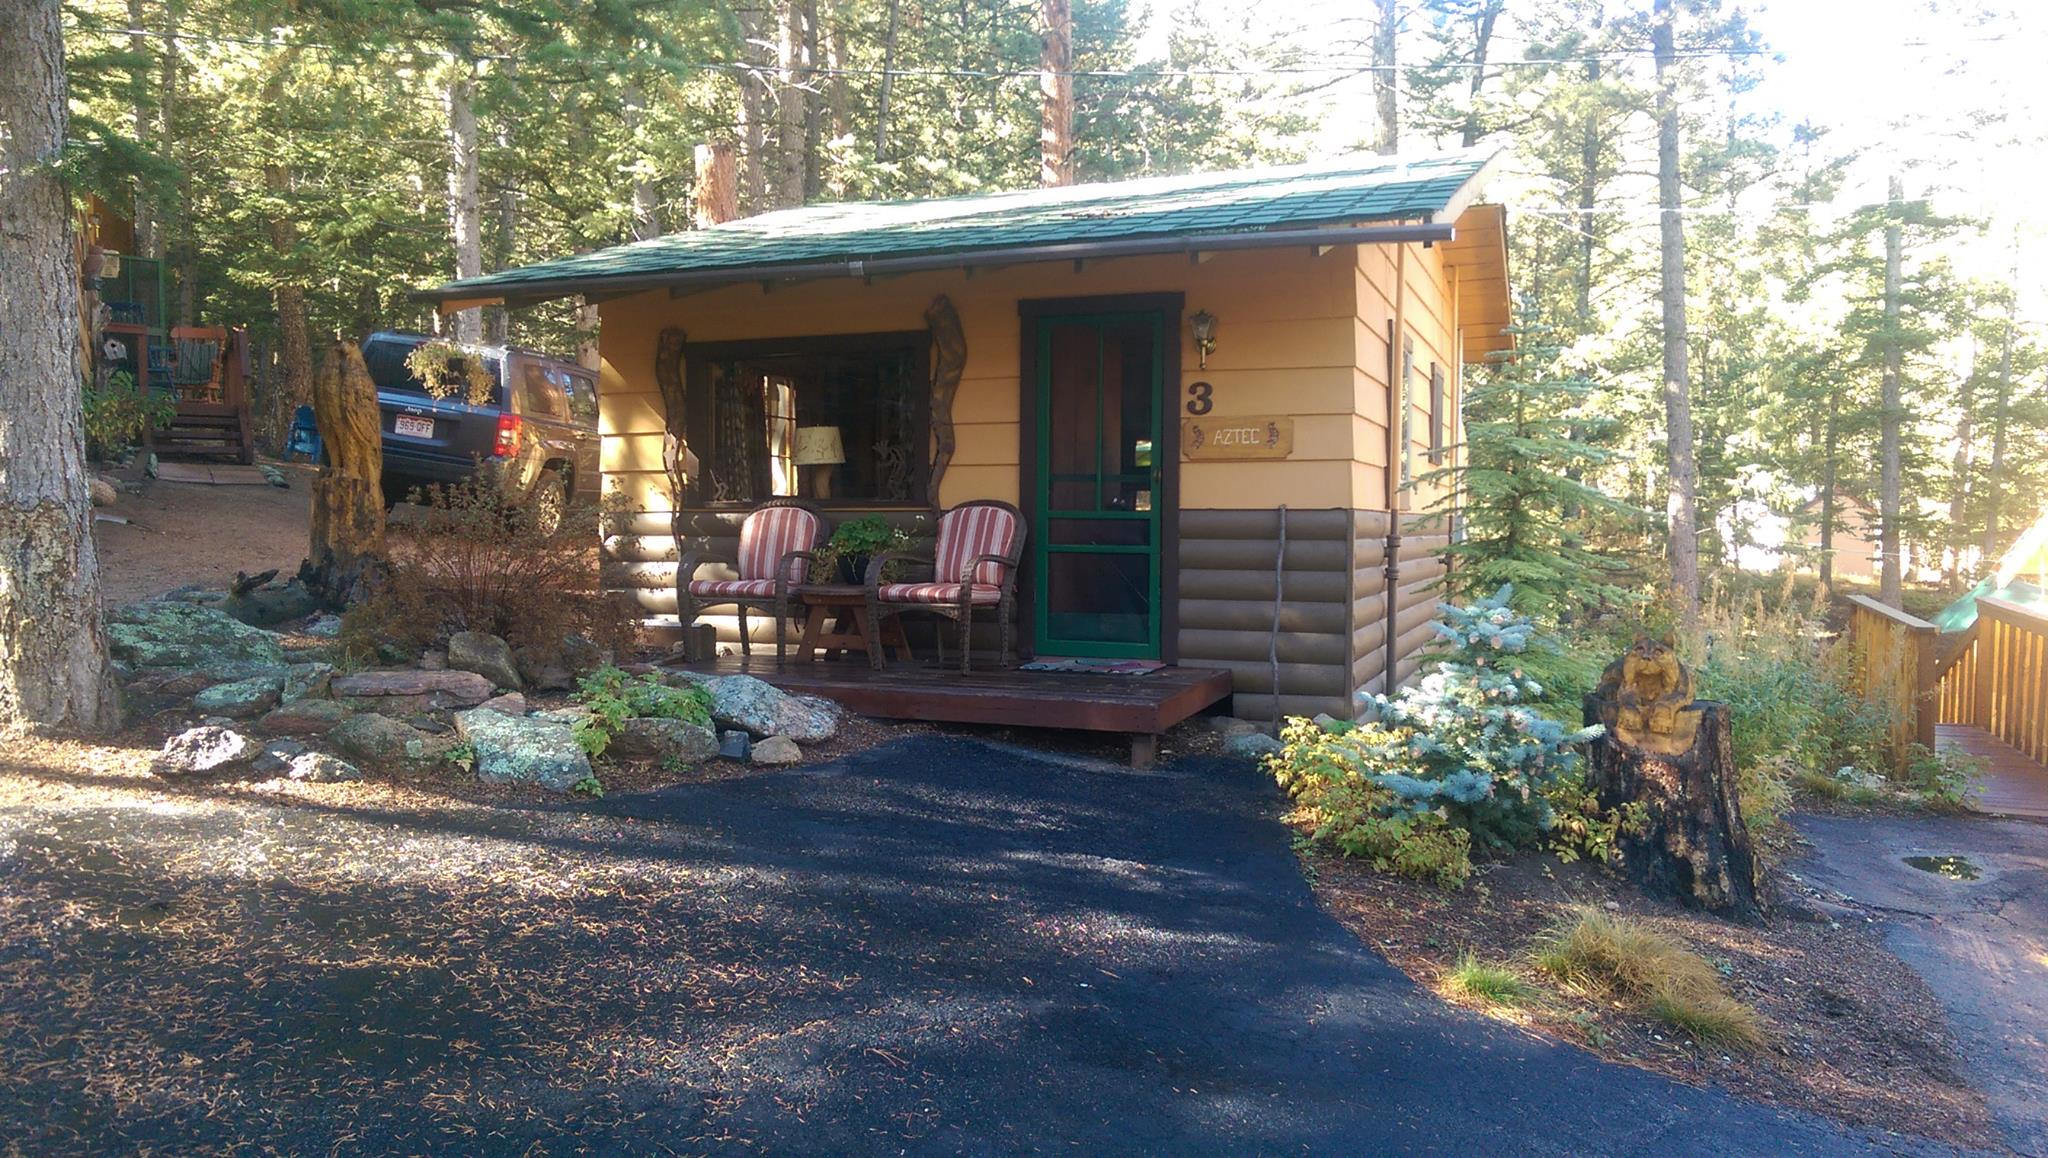 img exploration mountain cabins rentals elite usa vacation cabin park this estes co